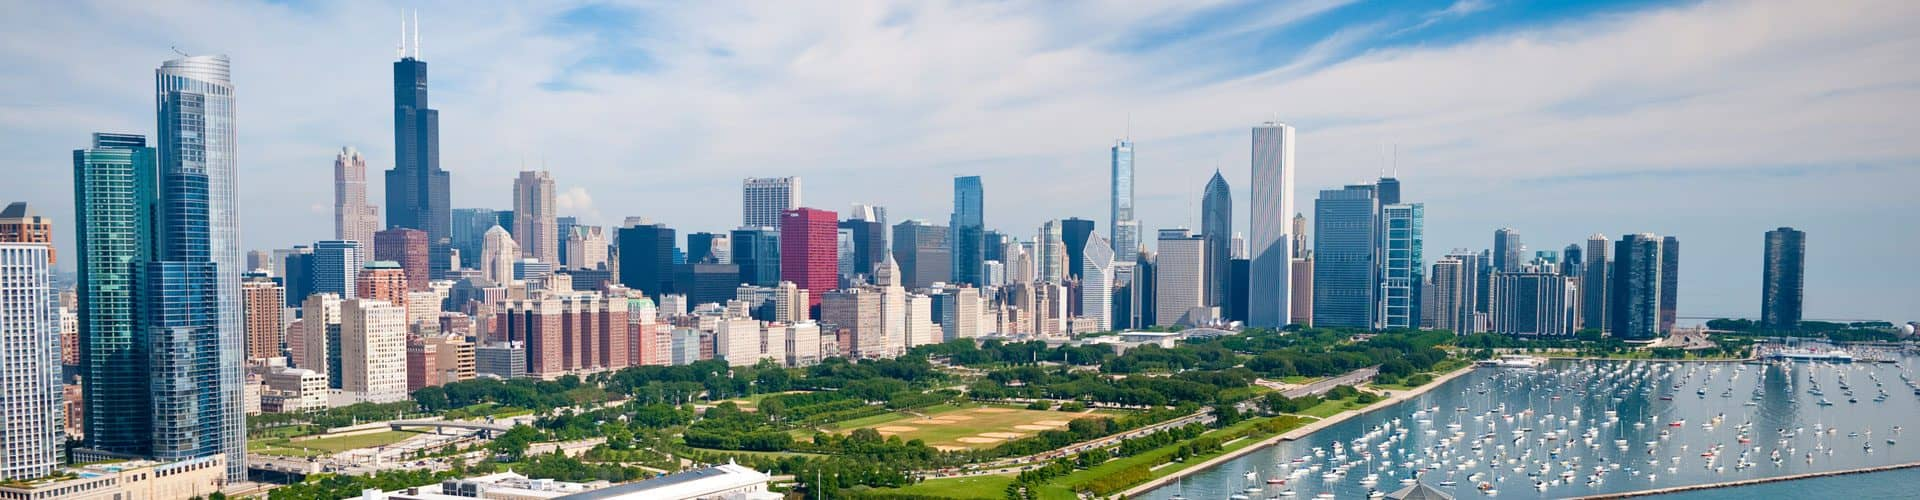 chicago_skyline_pan